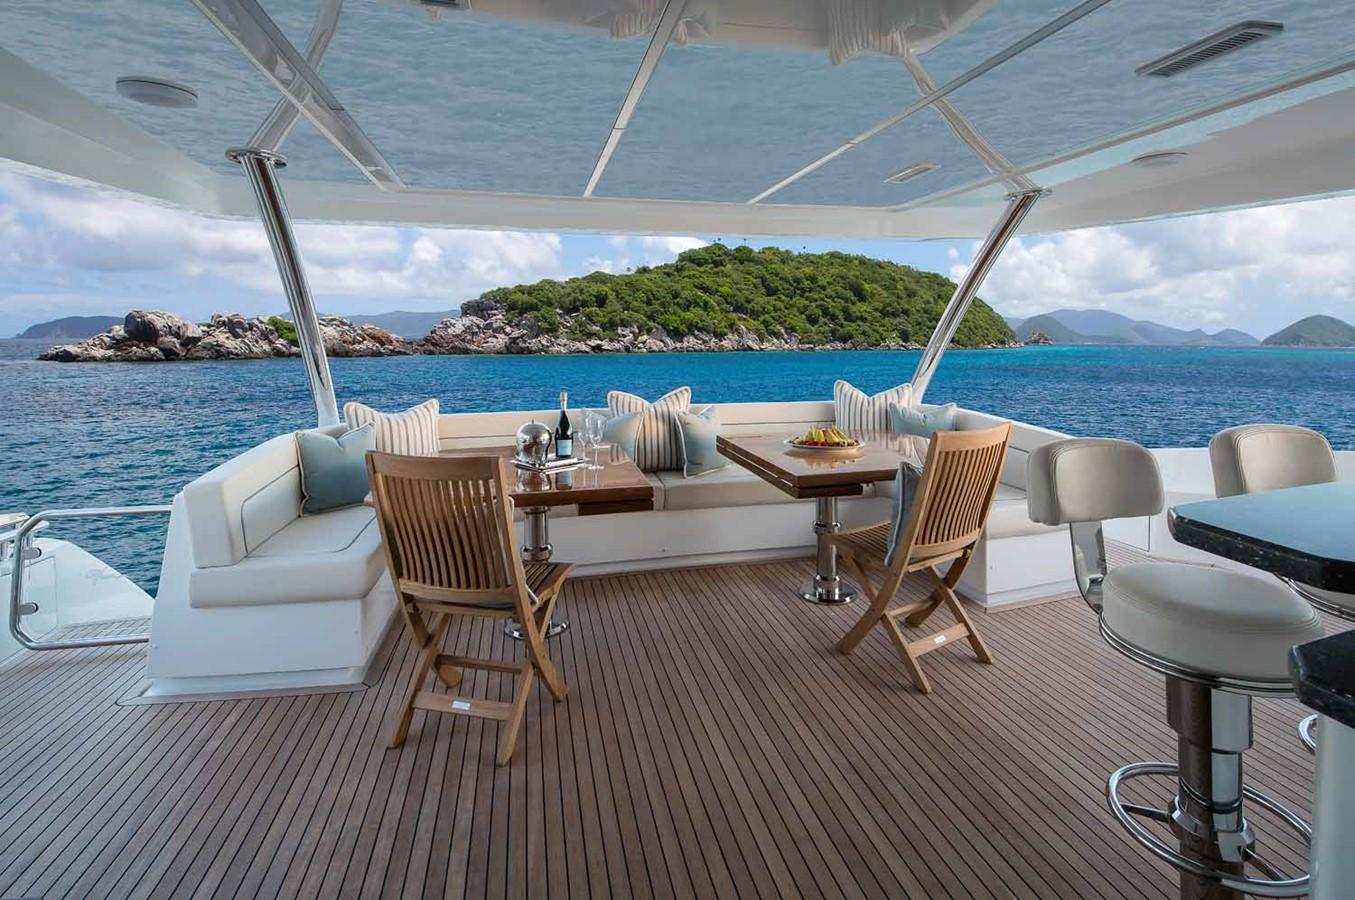 2019 VIKING Enclosed Bridge Motor Yacht 2463996